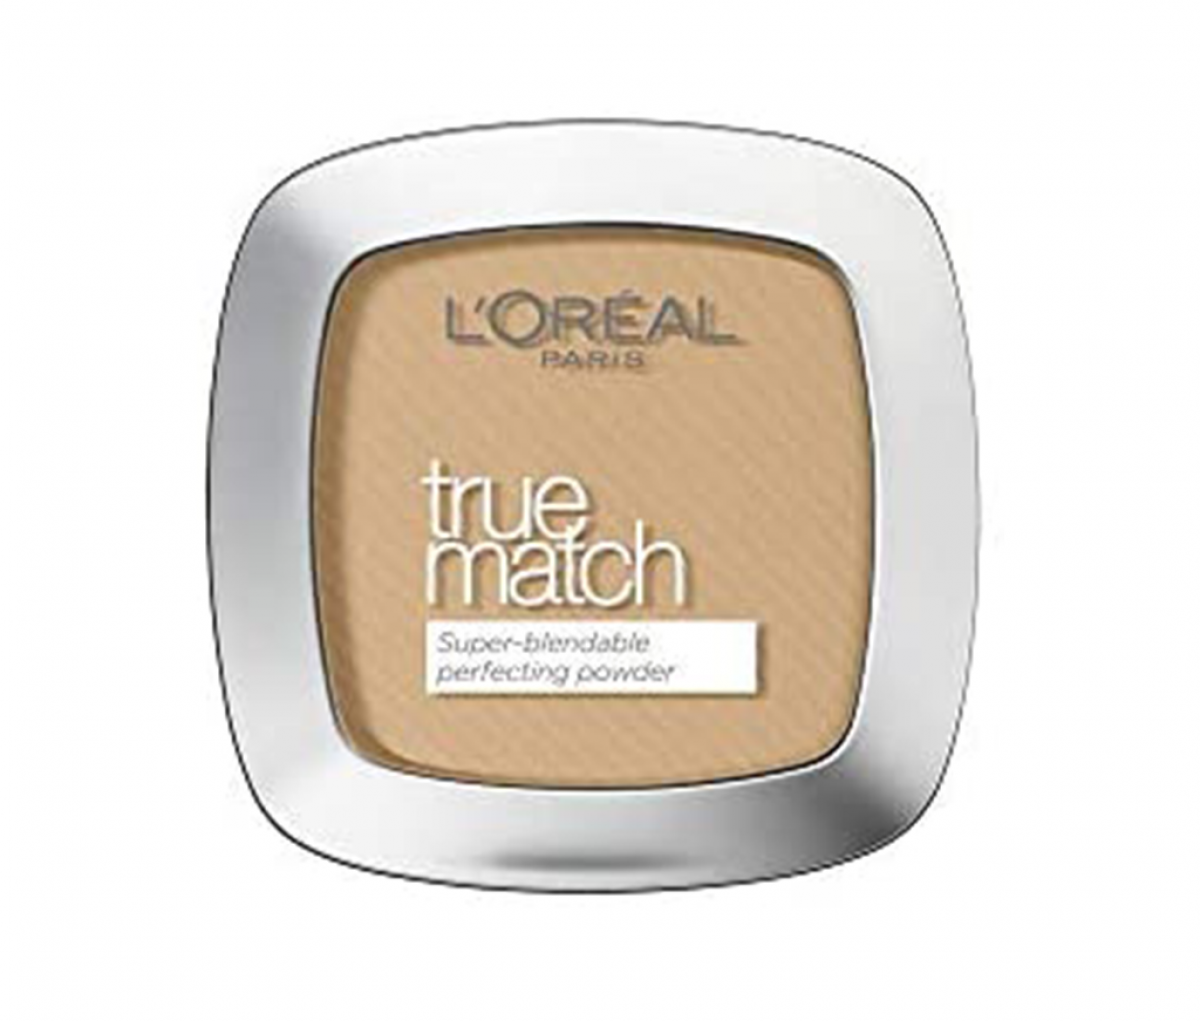 L'Oreal 3D/3W Golden Beige True Match Powder